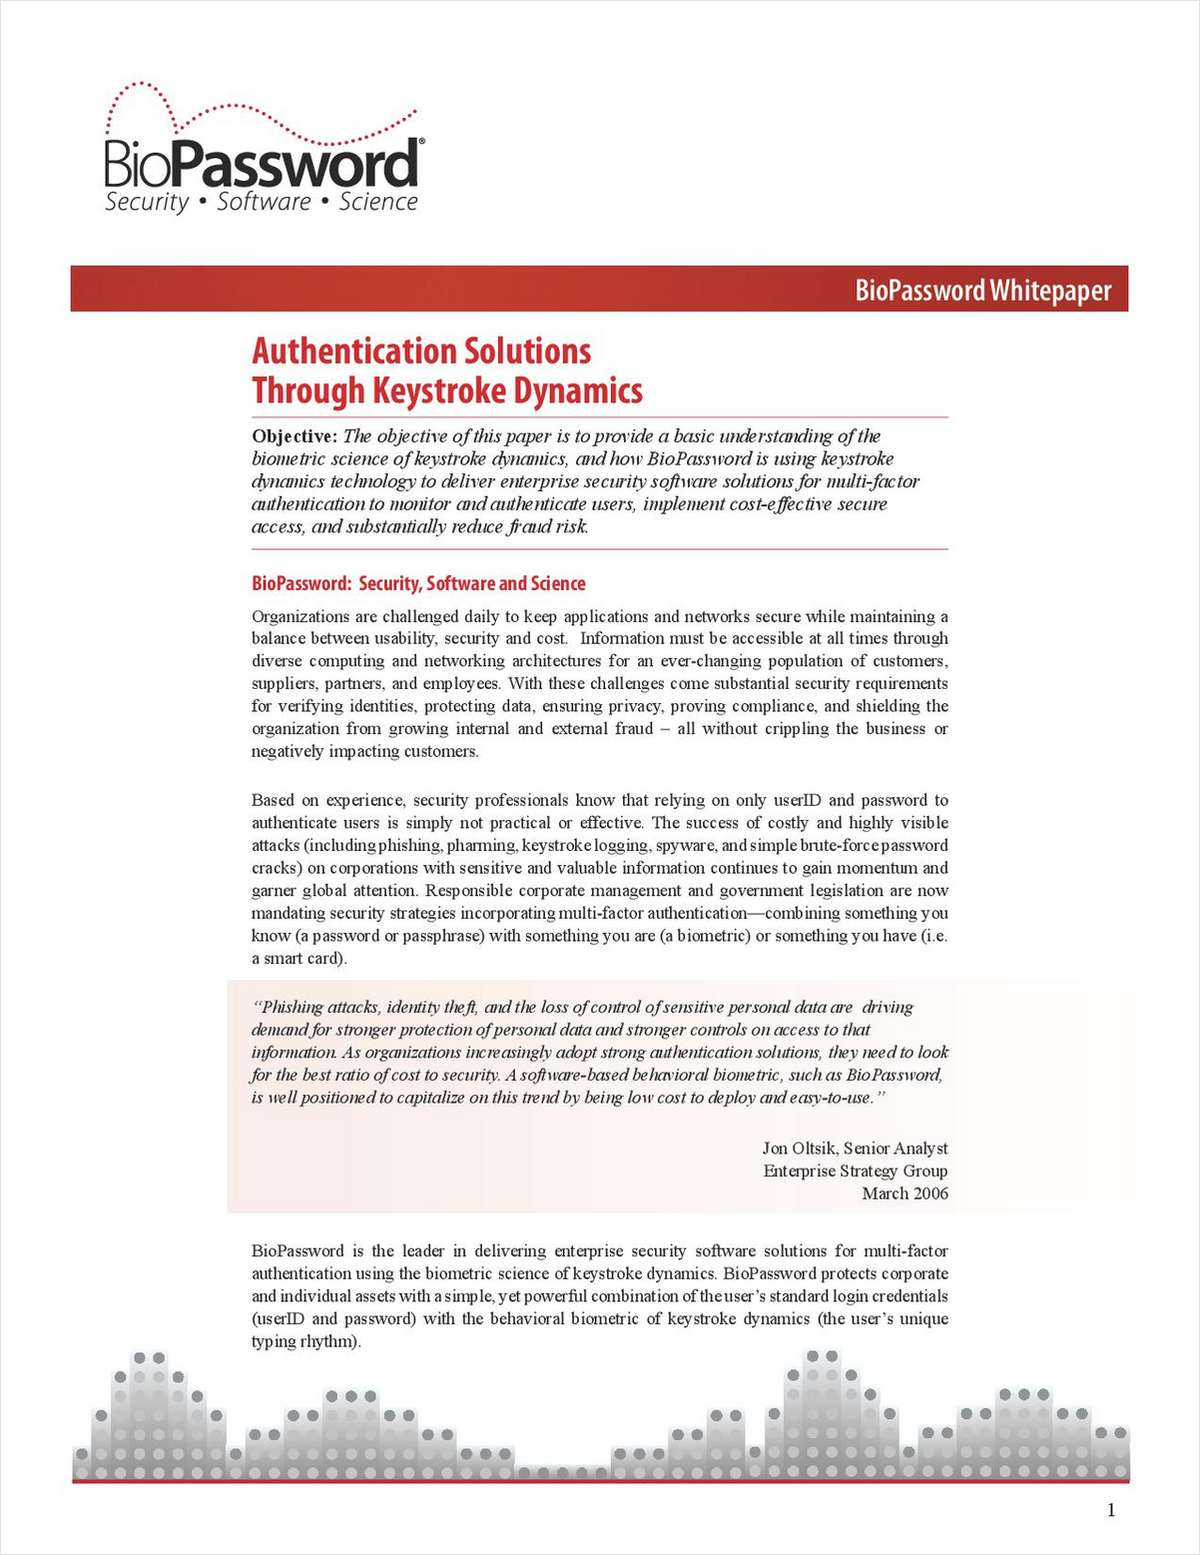 Authentication Solutions Through Keystroke Dynamics